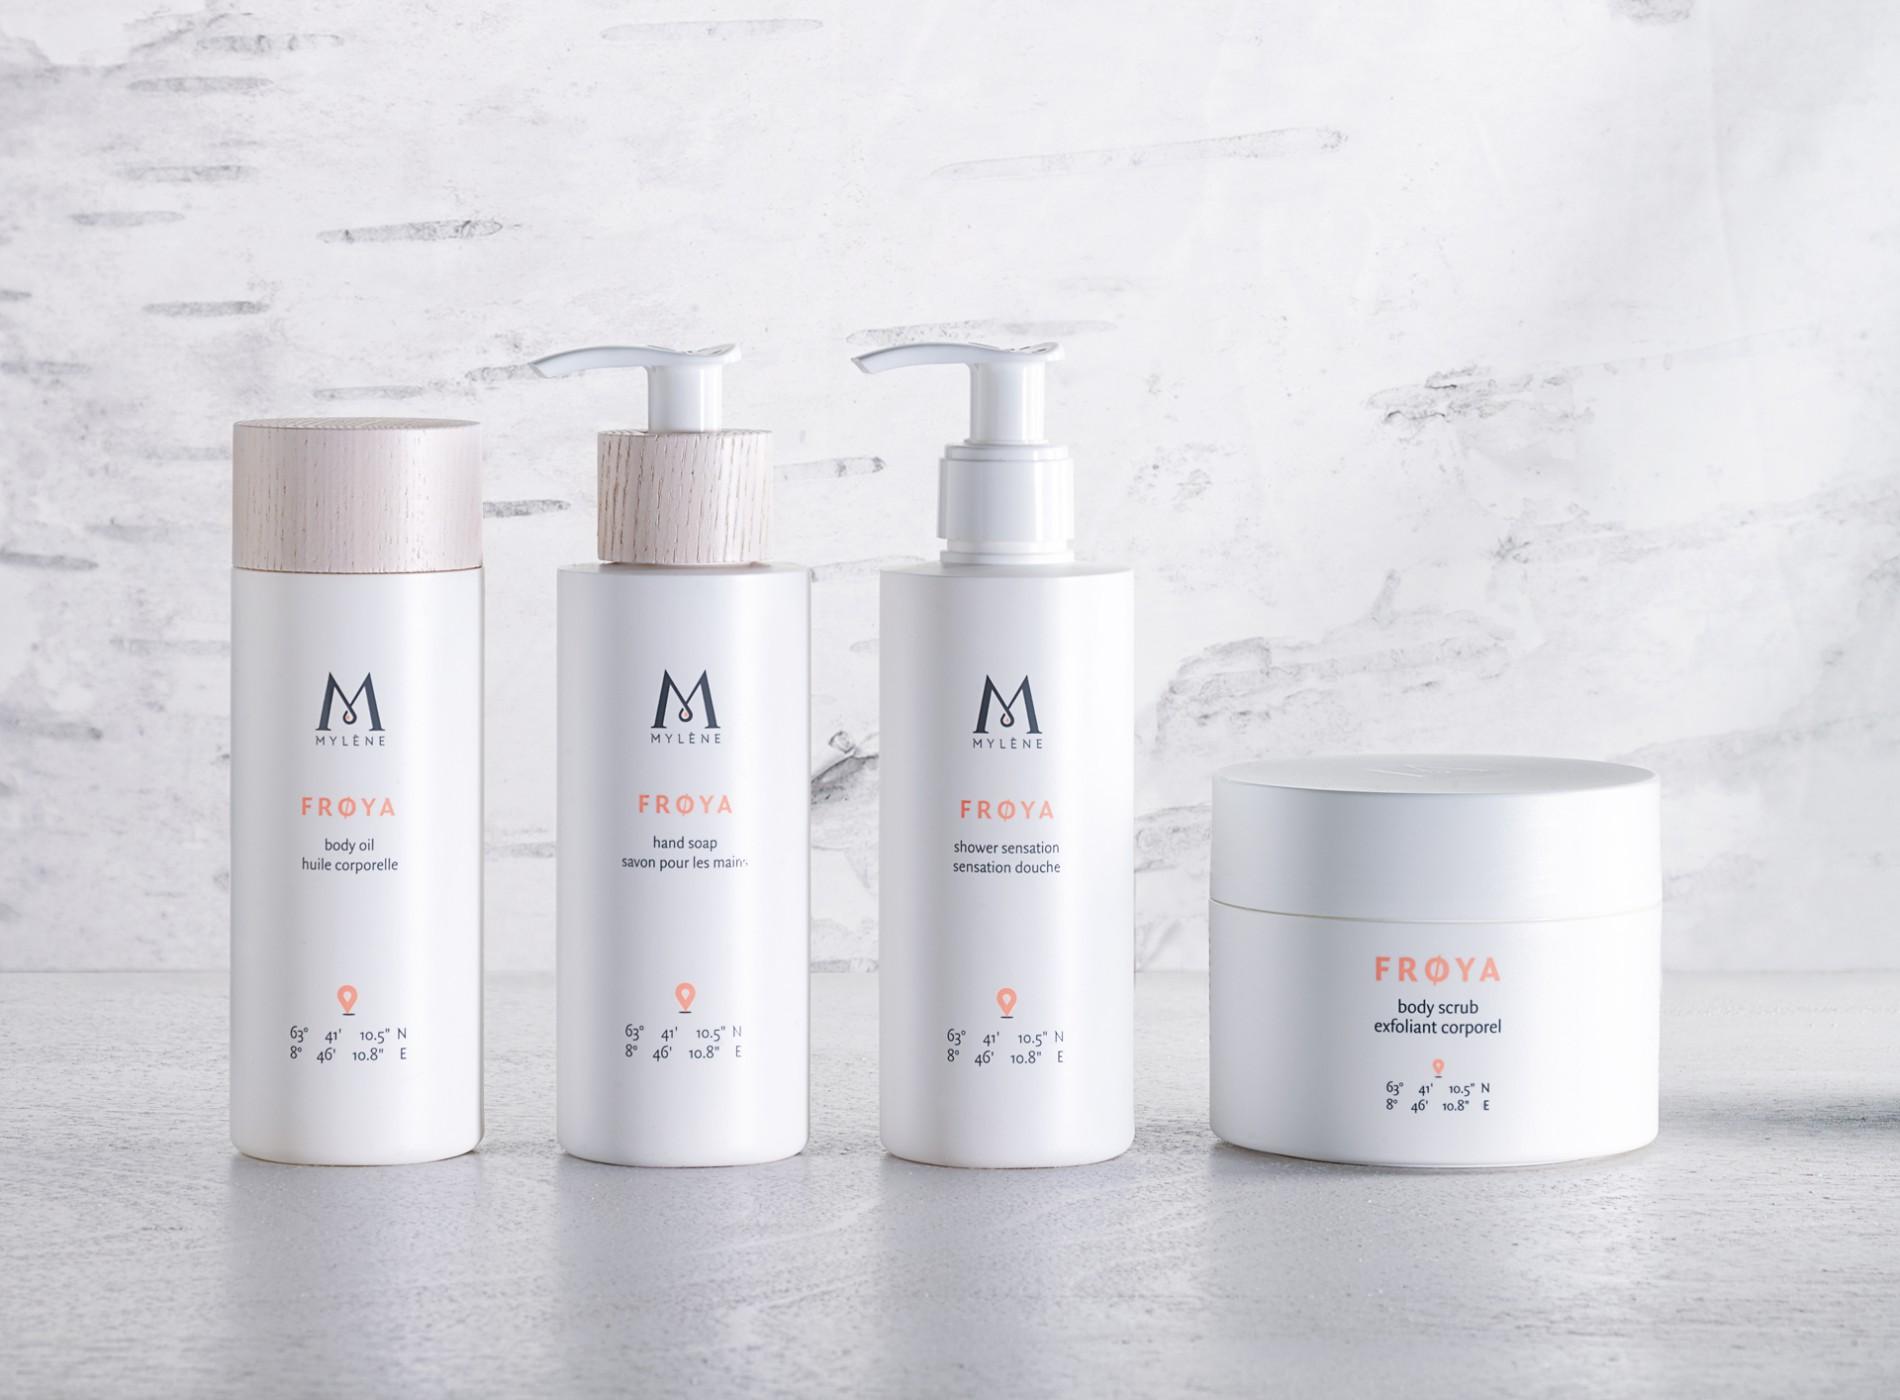 Mylène packaging realisation